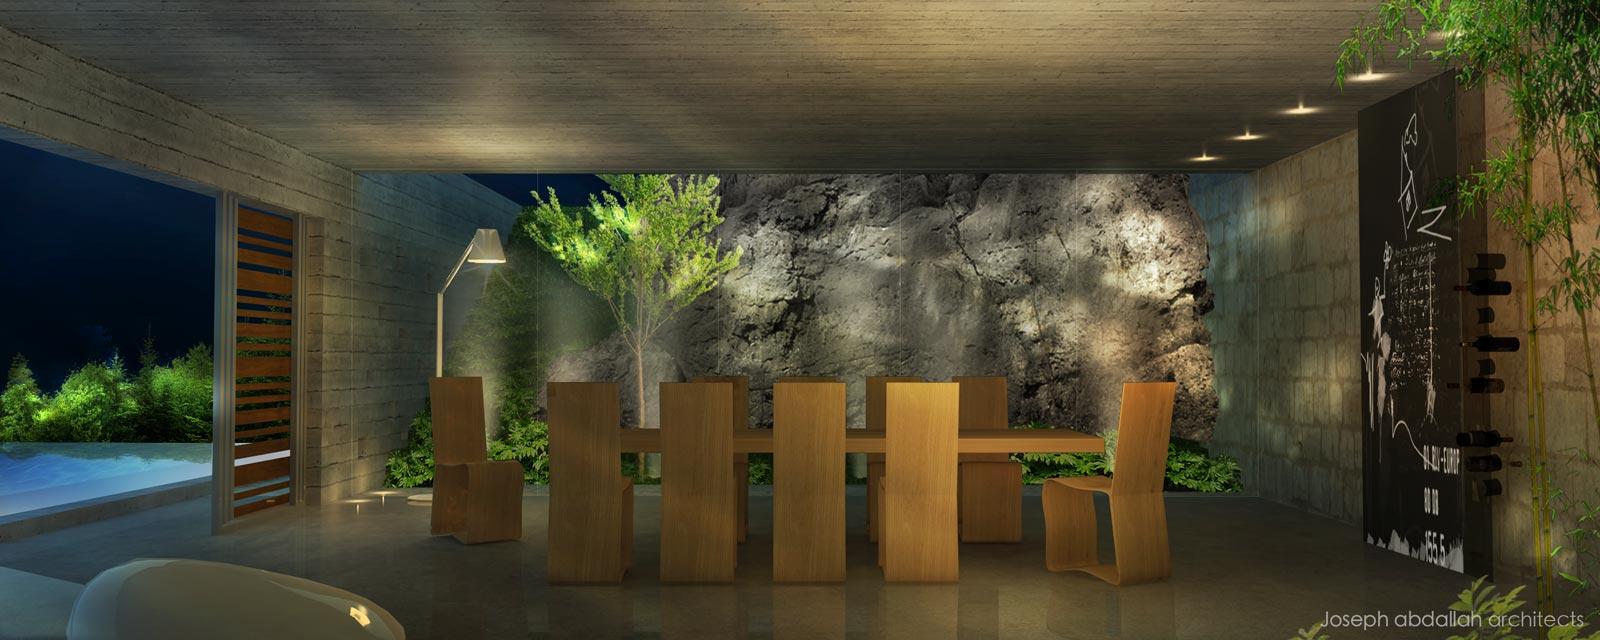 nassif-water-mirror-villa-lebanon-joseph-abdallah-architects-8